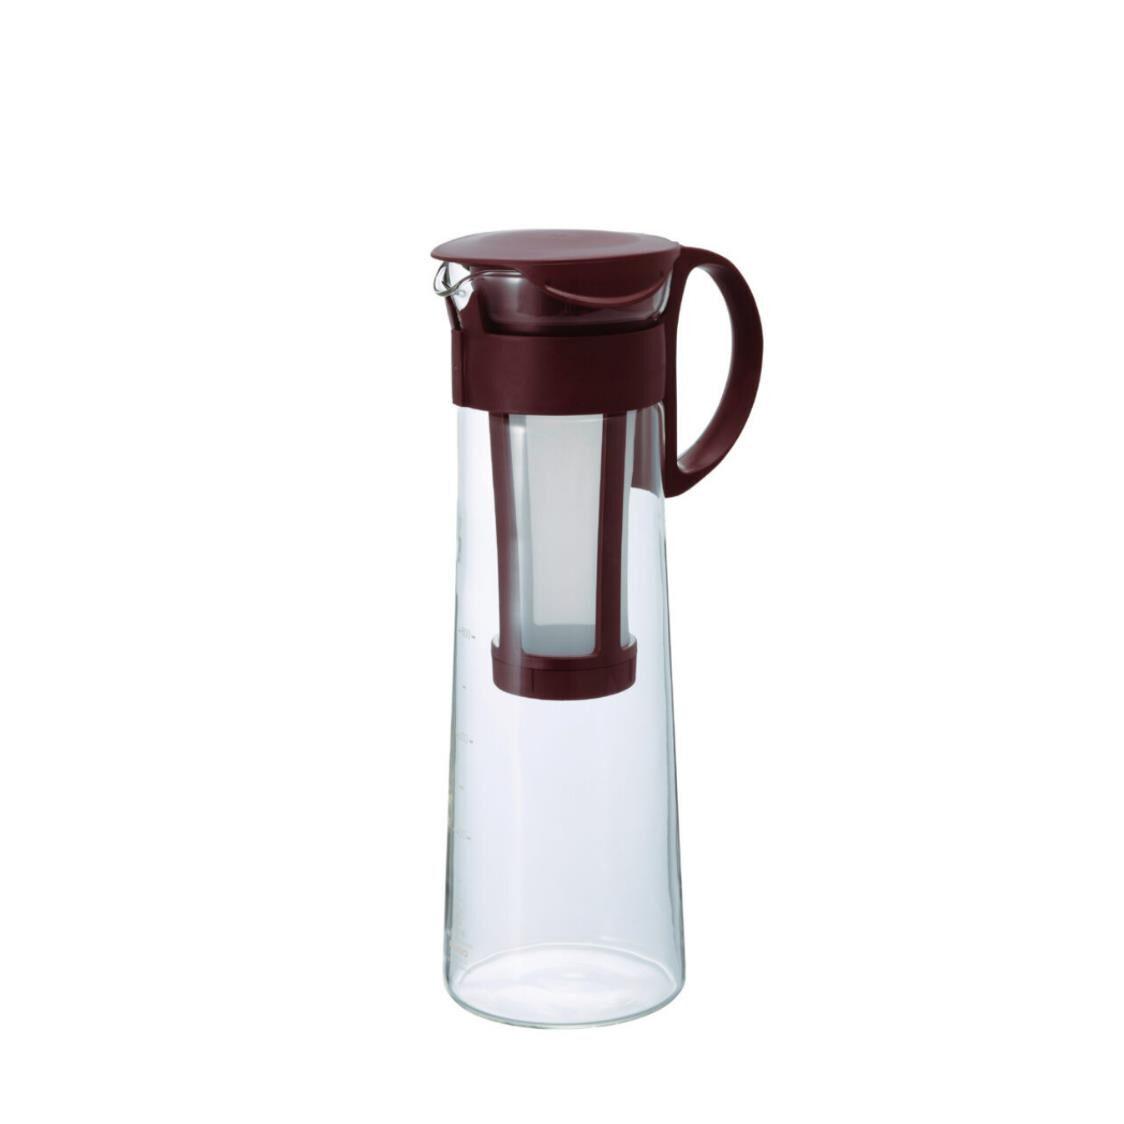 Hario Mizudashi Cold Brew Coffee Pot Water Pitcher With Built-in Strainer Brown 1000ml